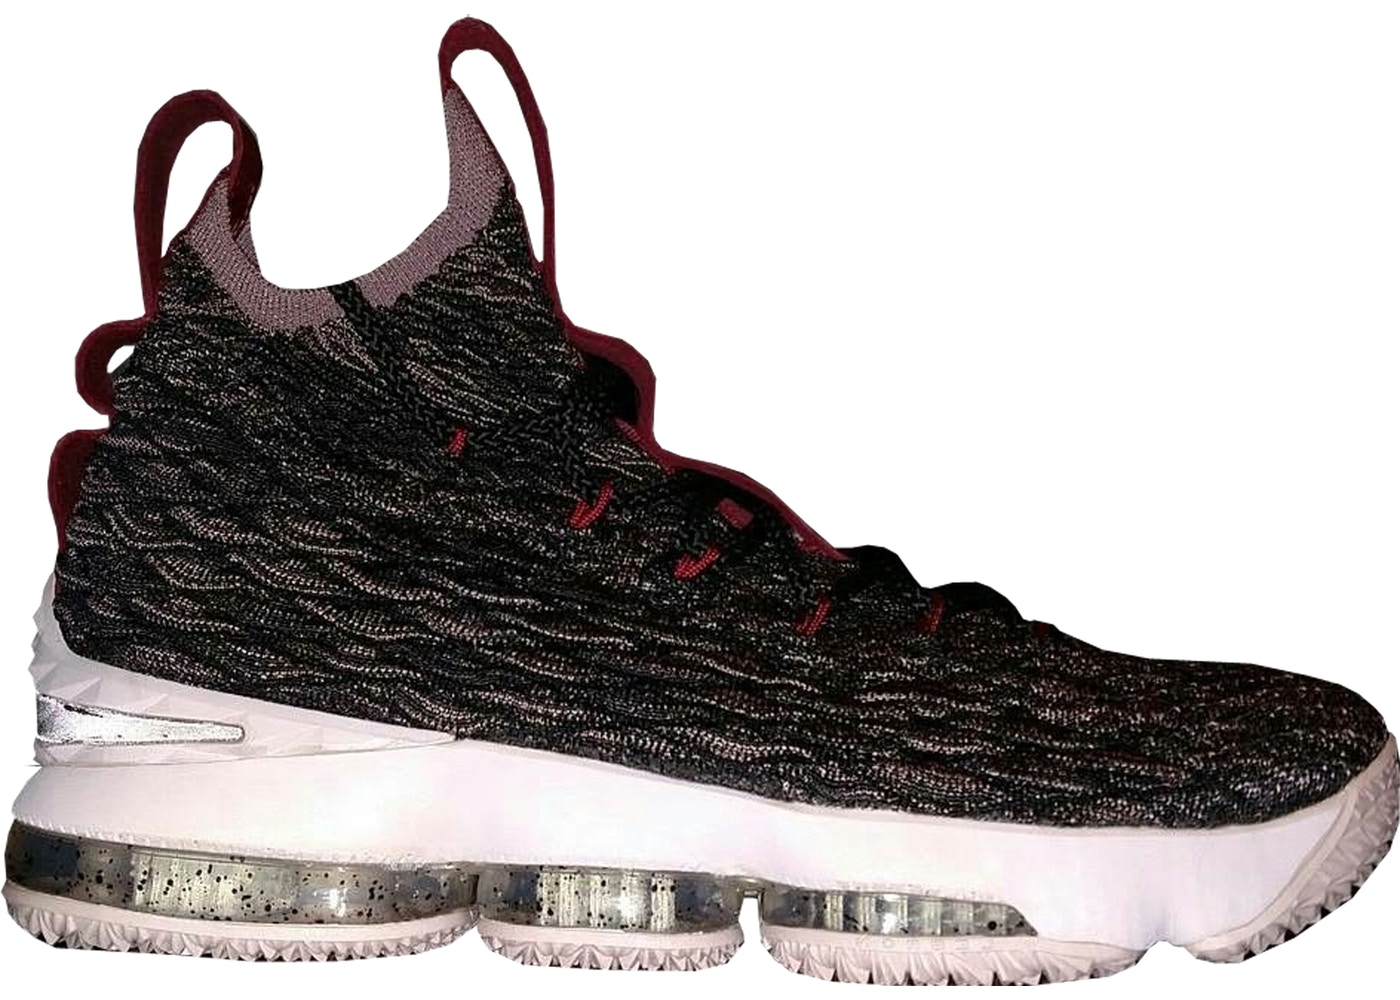 sale retailer bba11 cd46e Buy Nike LeBron 15 Shoes & Deadstock Sneakers